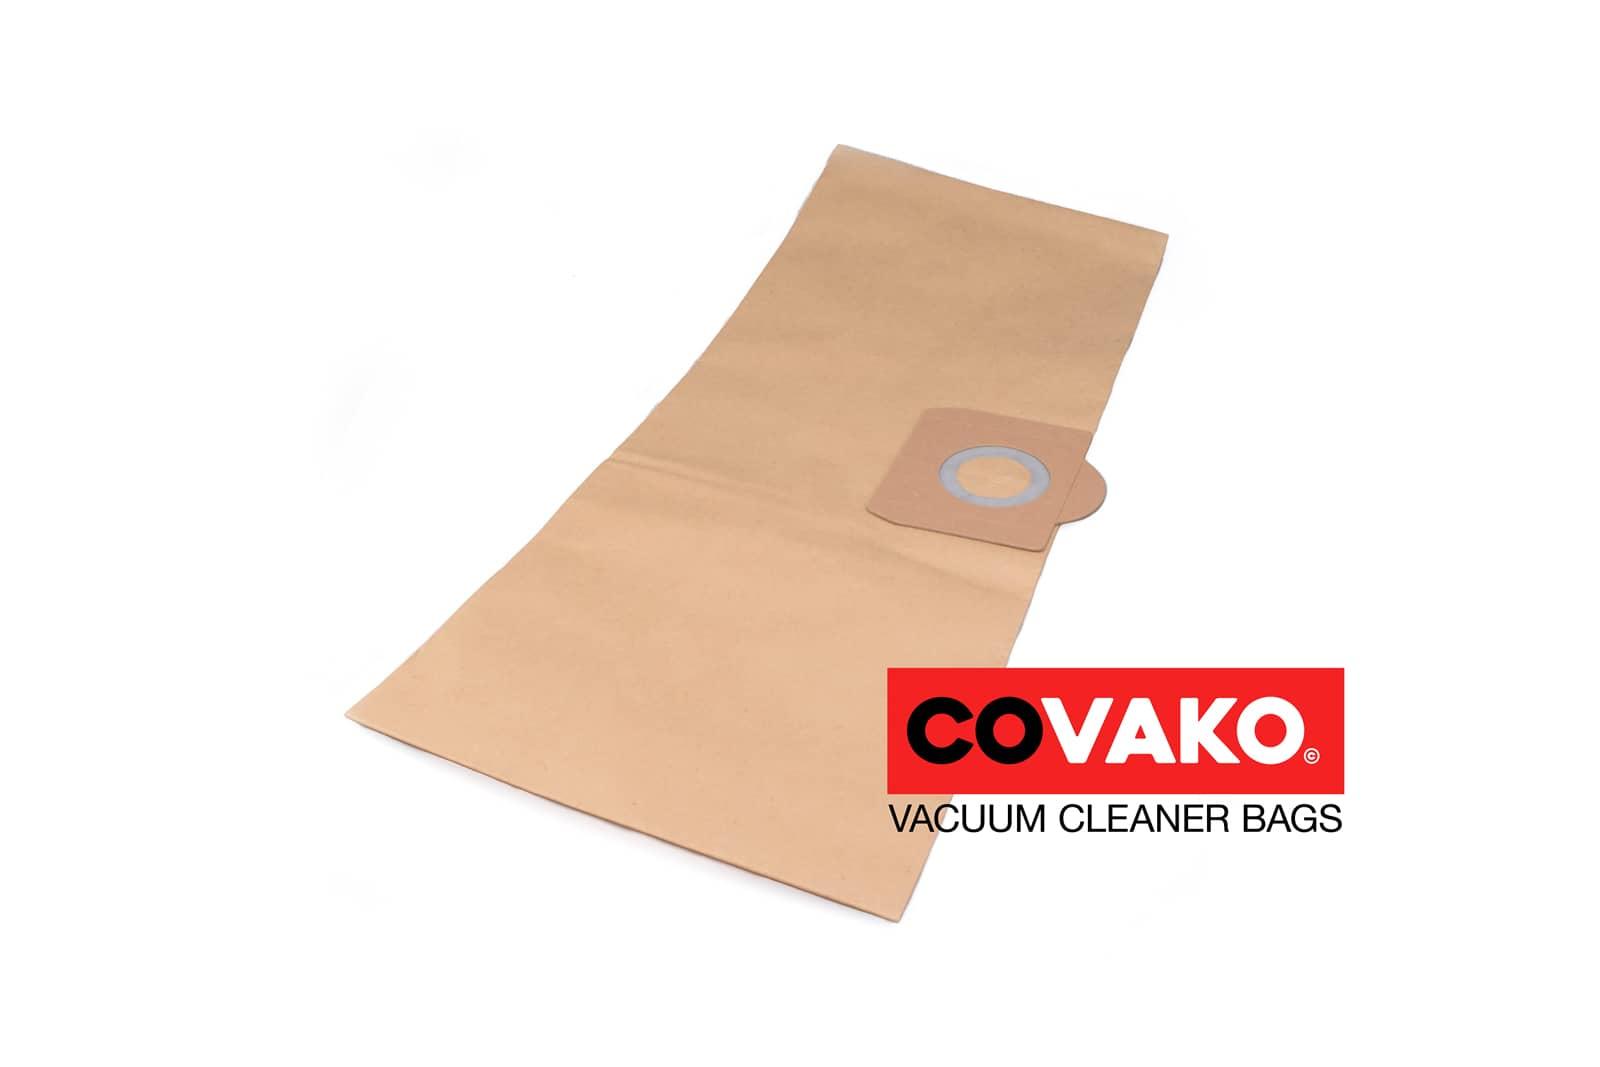 AquaVac Bonus / Paper - AquaVac vacuum cleaner bags